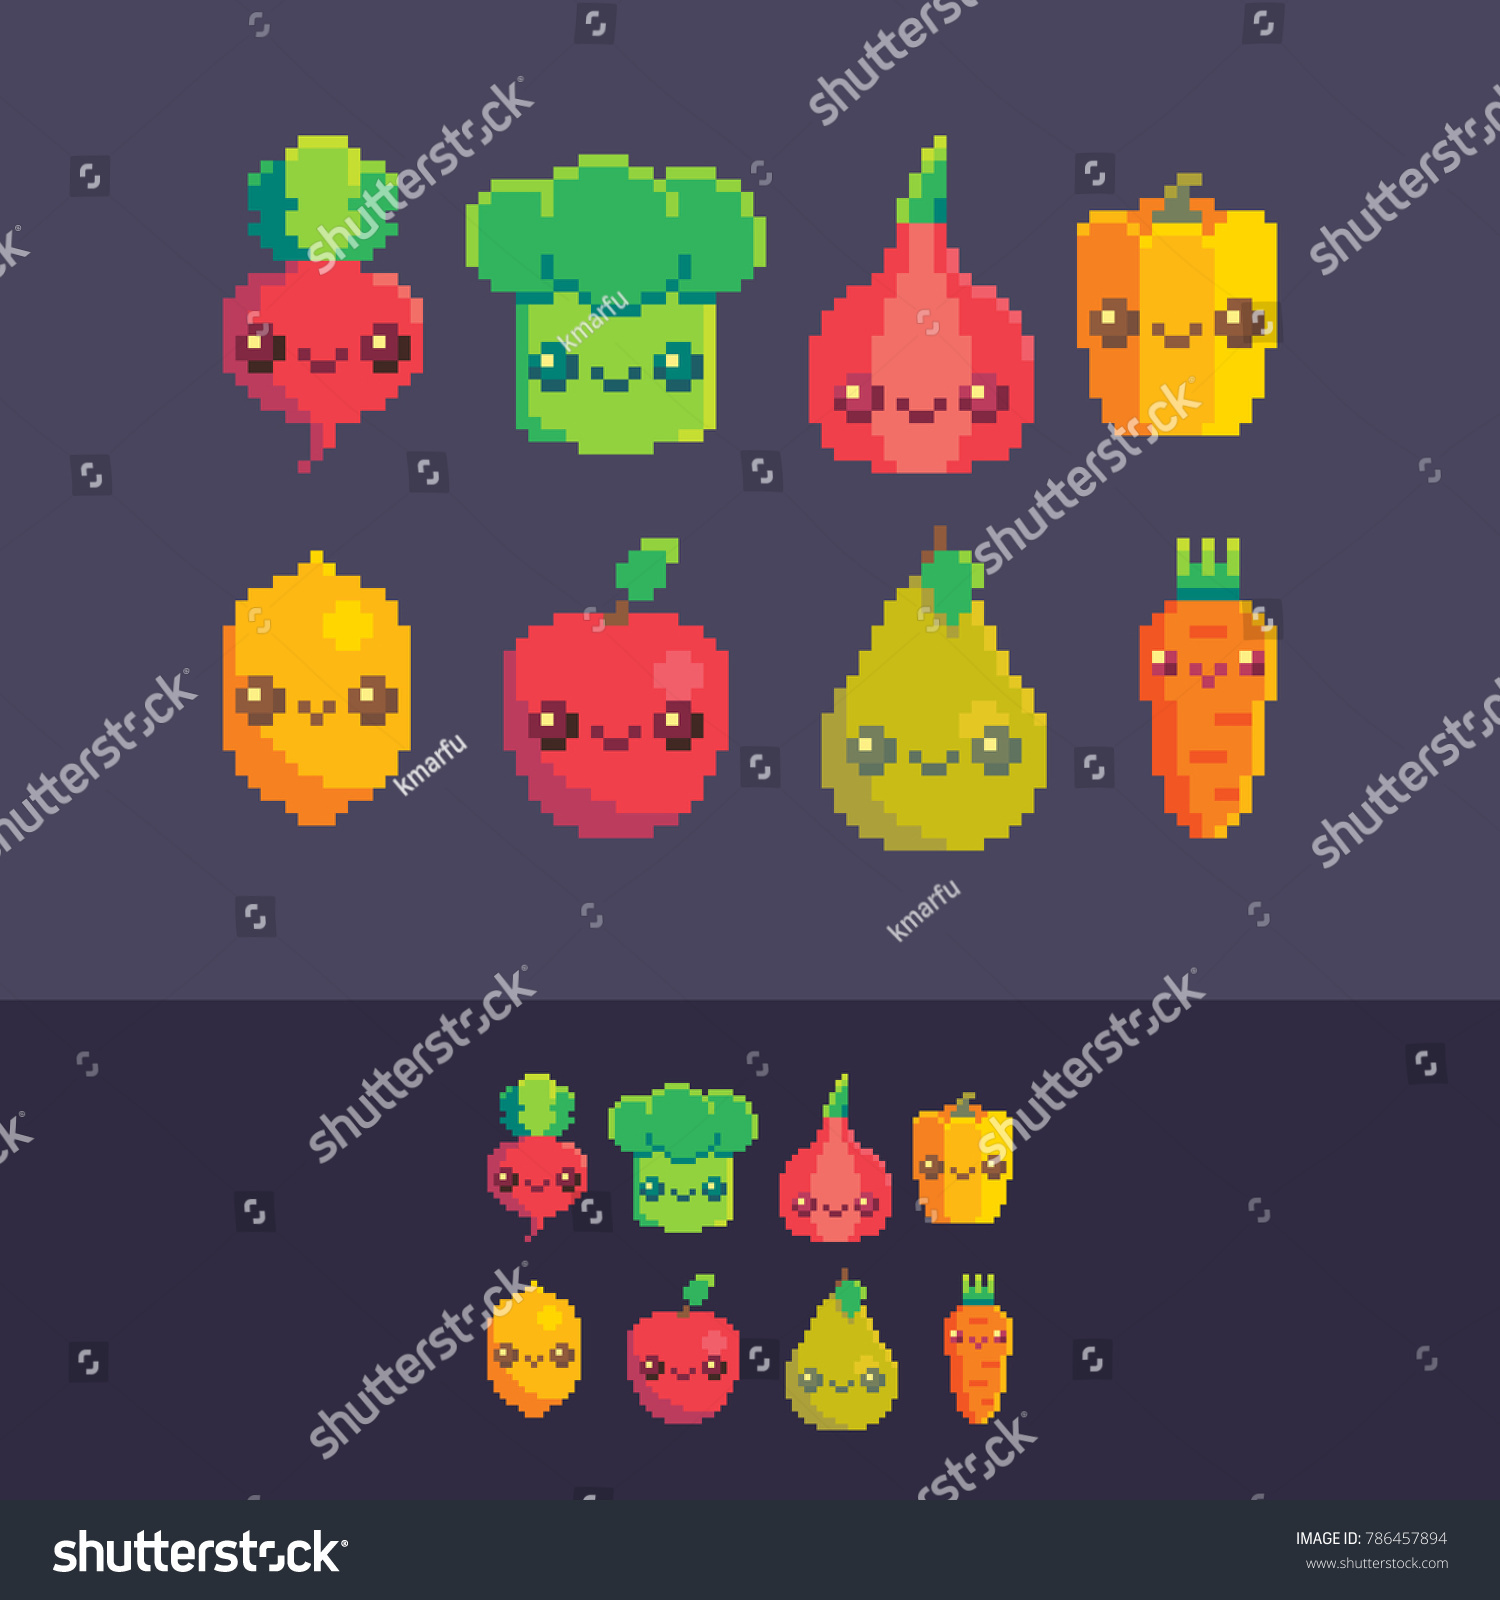 Image Vectorielle De Stock De Pixel Art Vector Cute Vegetables Fruits 786457894